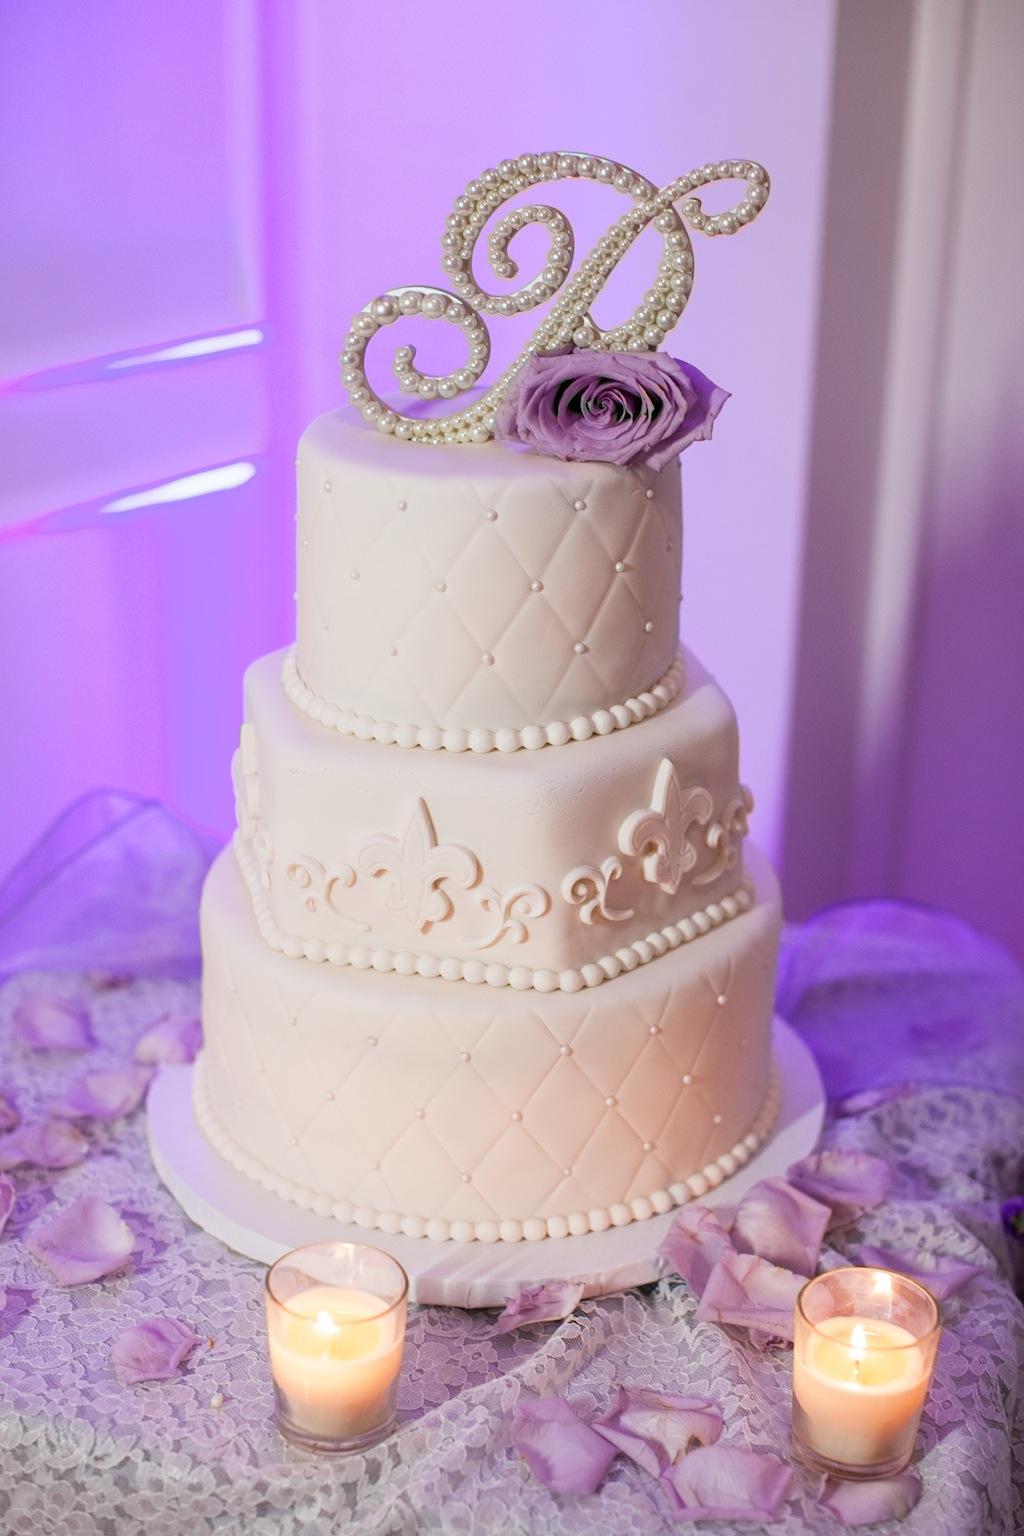 Brooksville Wedding - Purple, Silver & Ivory Wedding at Southern Hills Plantation Club - Brooksville Wedding Photographer Blue Lane Studios (57)